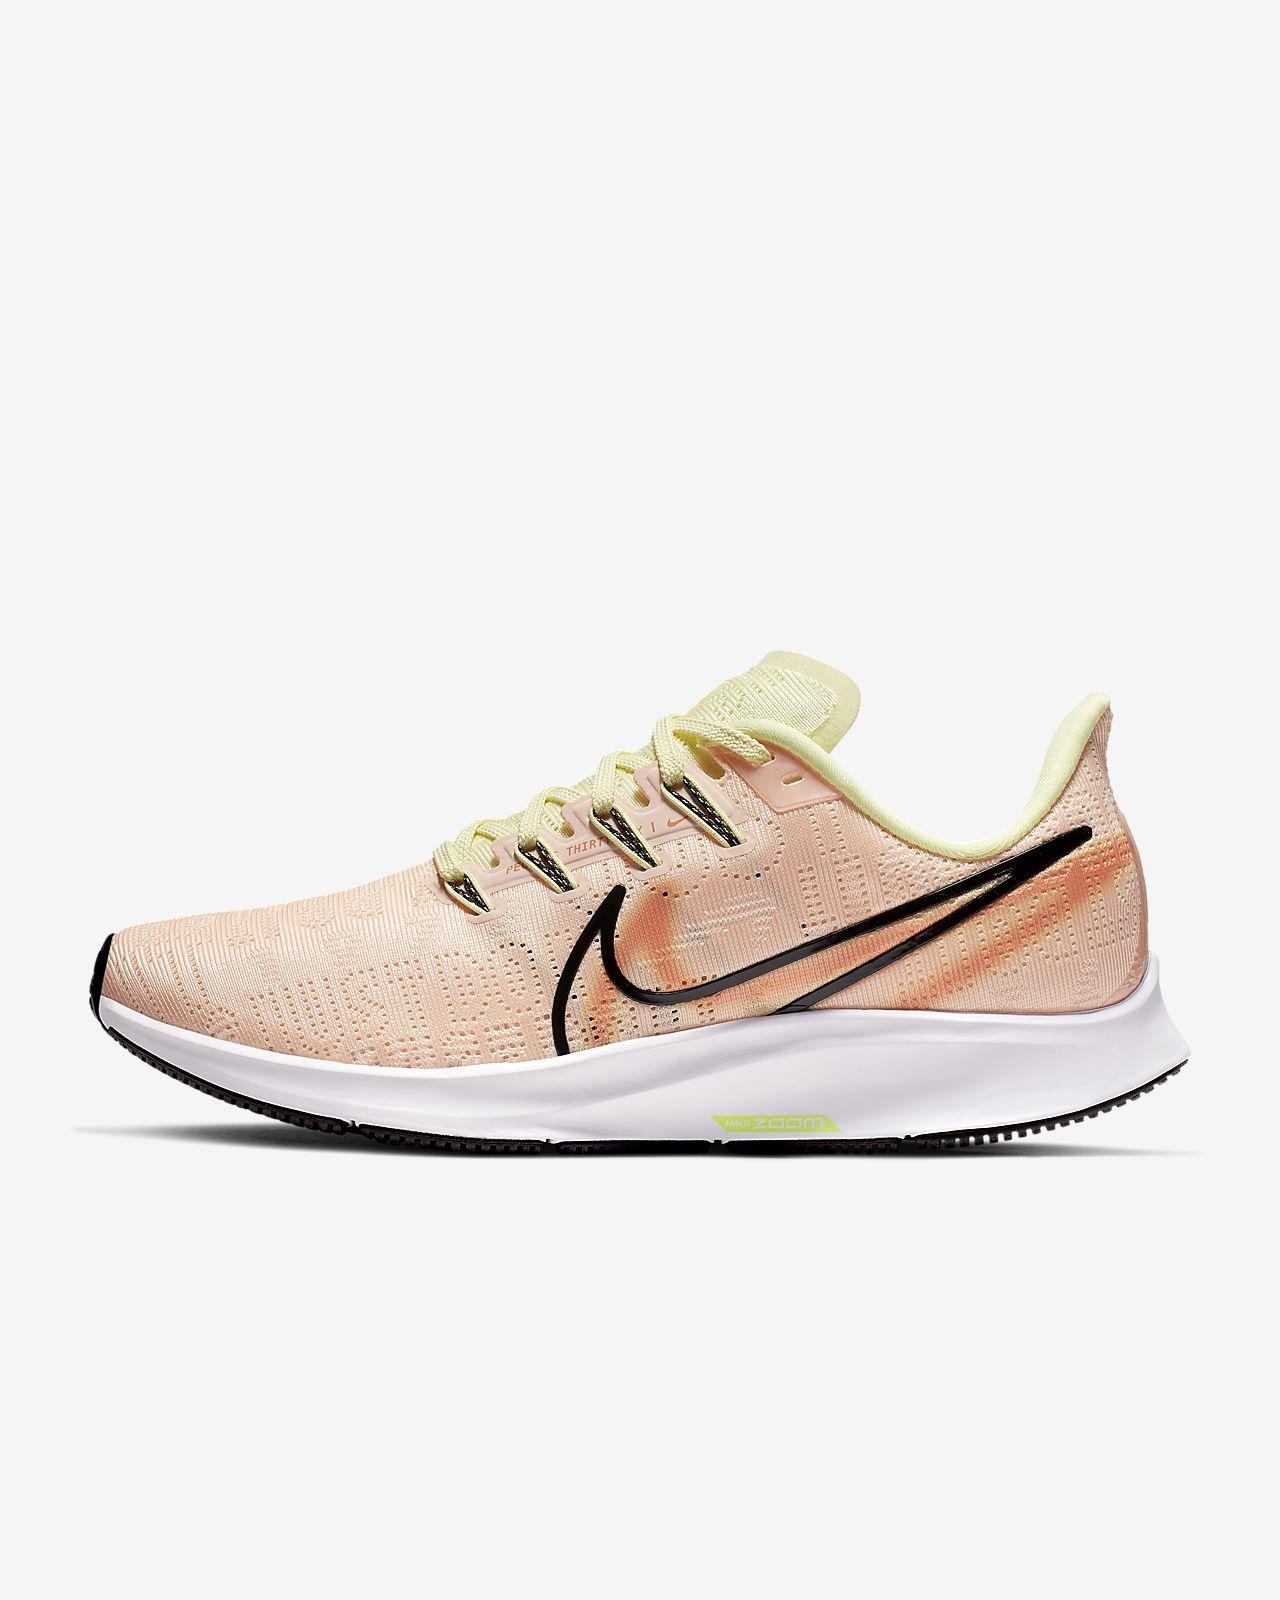 5dbb9a9159 ... Nike Air Zoom Pegasus 36 Premium Rise Zapatillas de running - Mujer